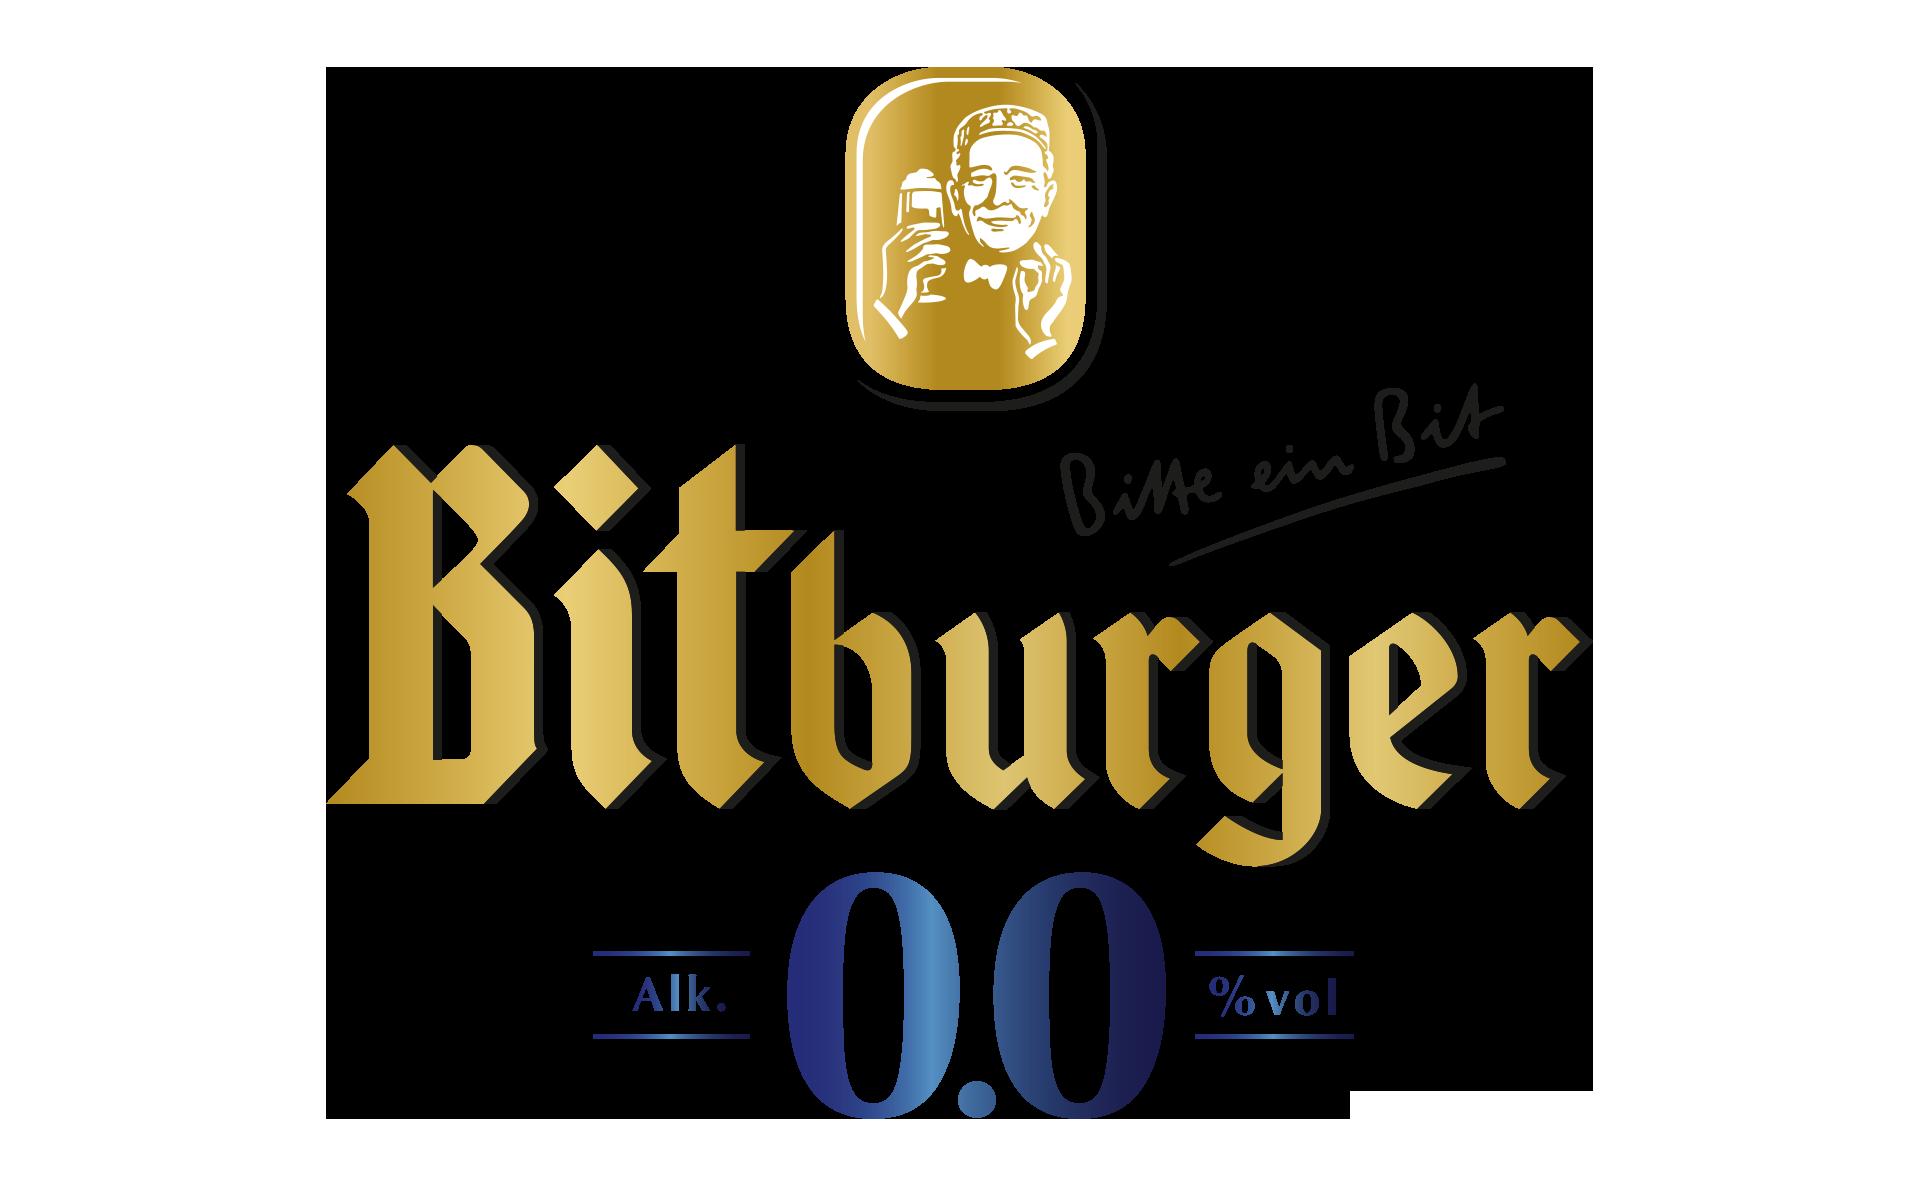 Bitburger 0,0 alkoholfrei